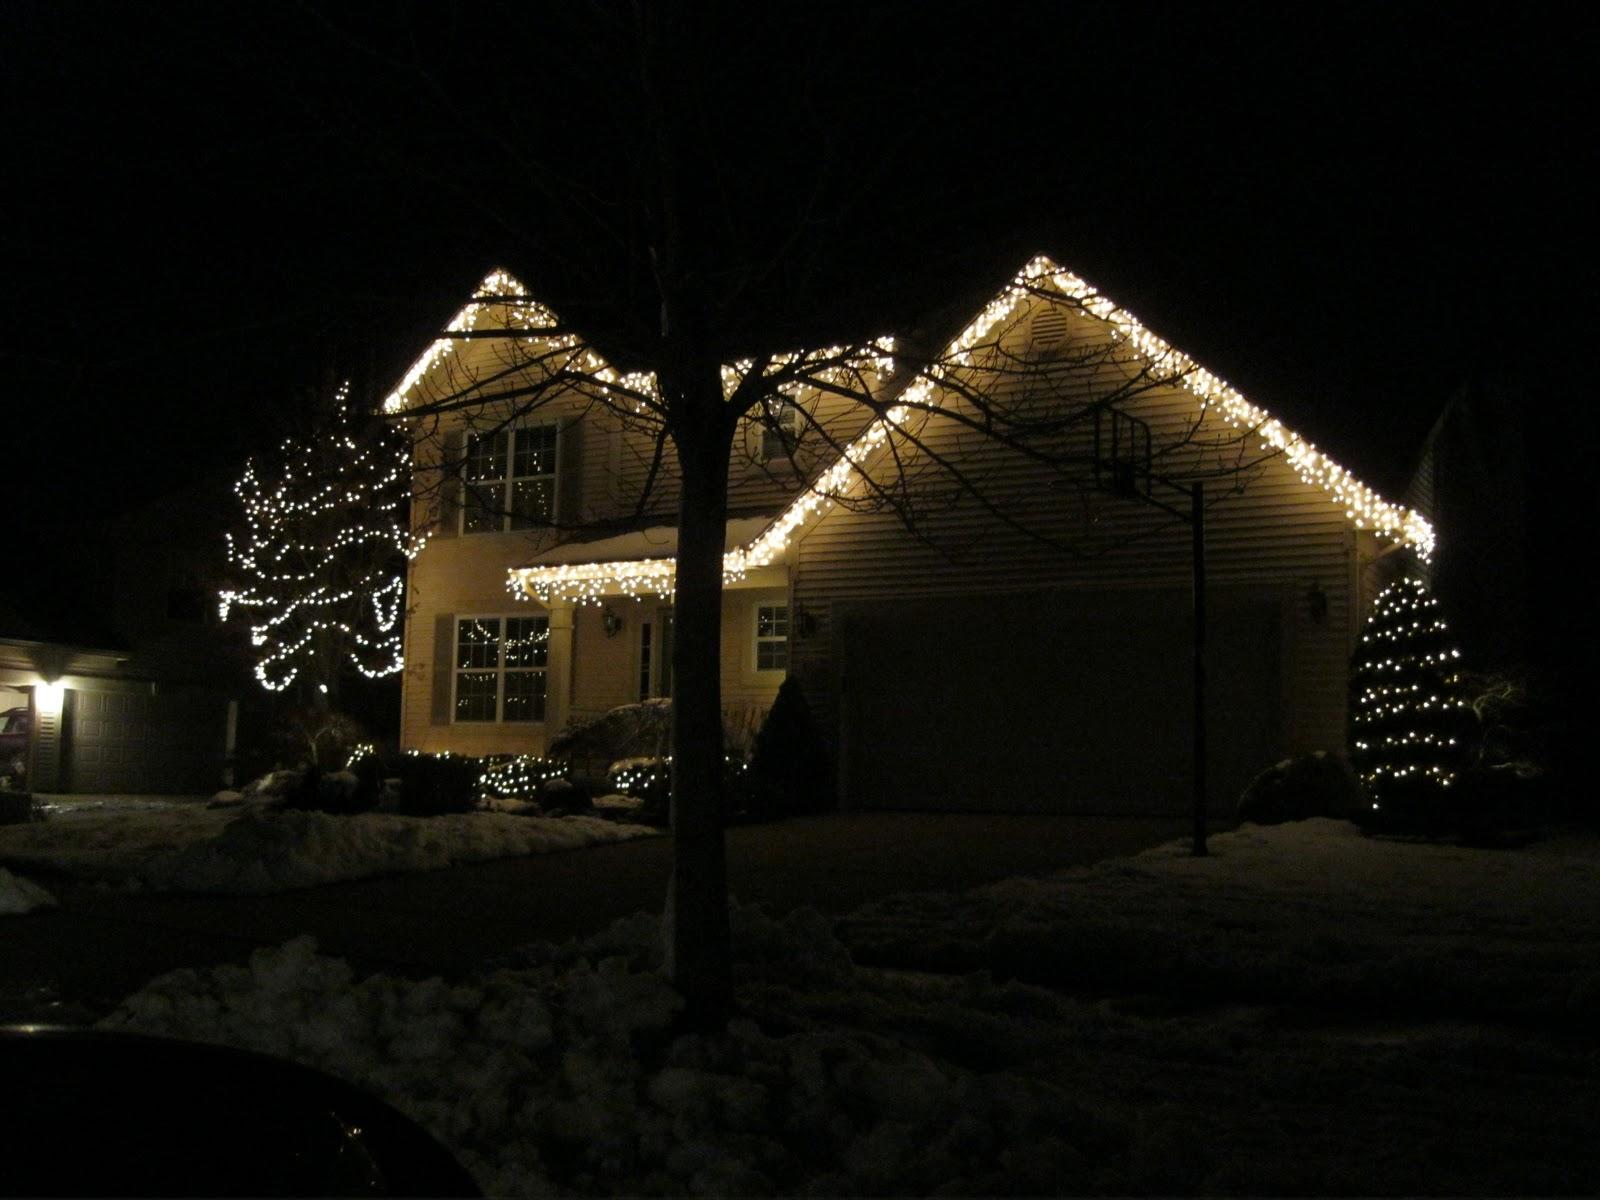 Christmas Lights On Houses.South African Girl In America Christmas Lights On Houses